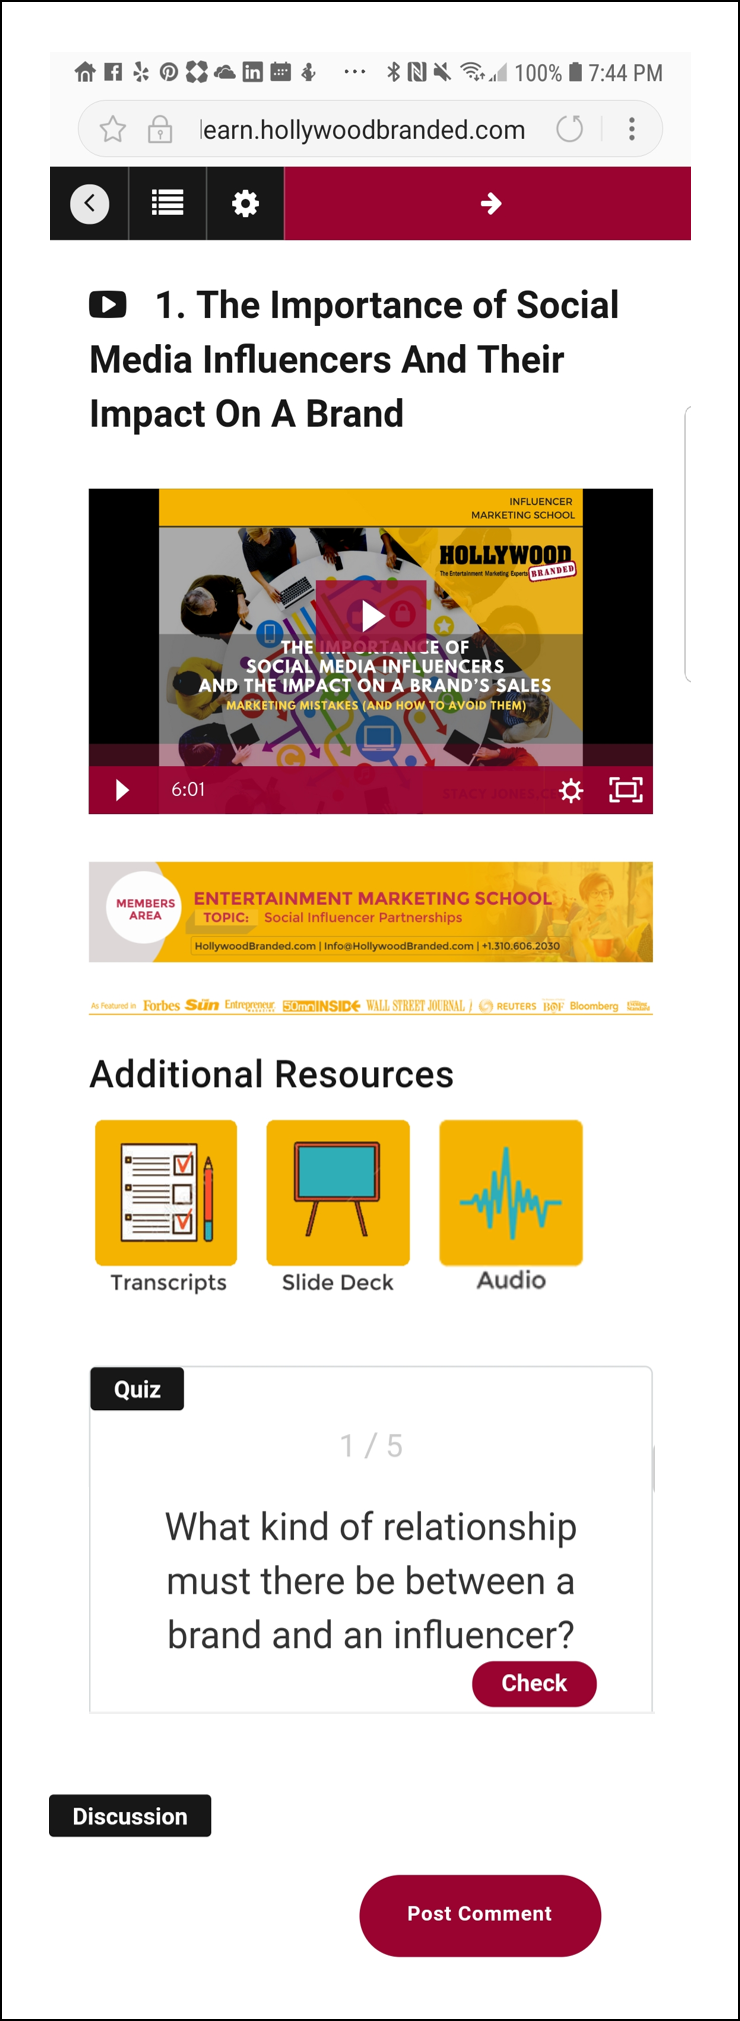 Influencer Marketing School Layout image